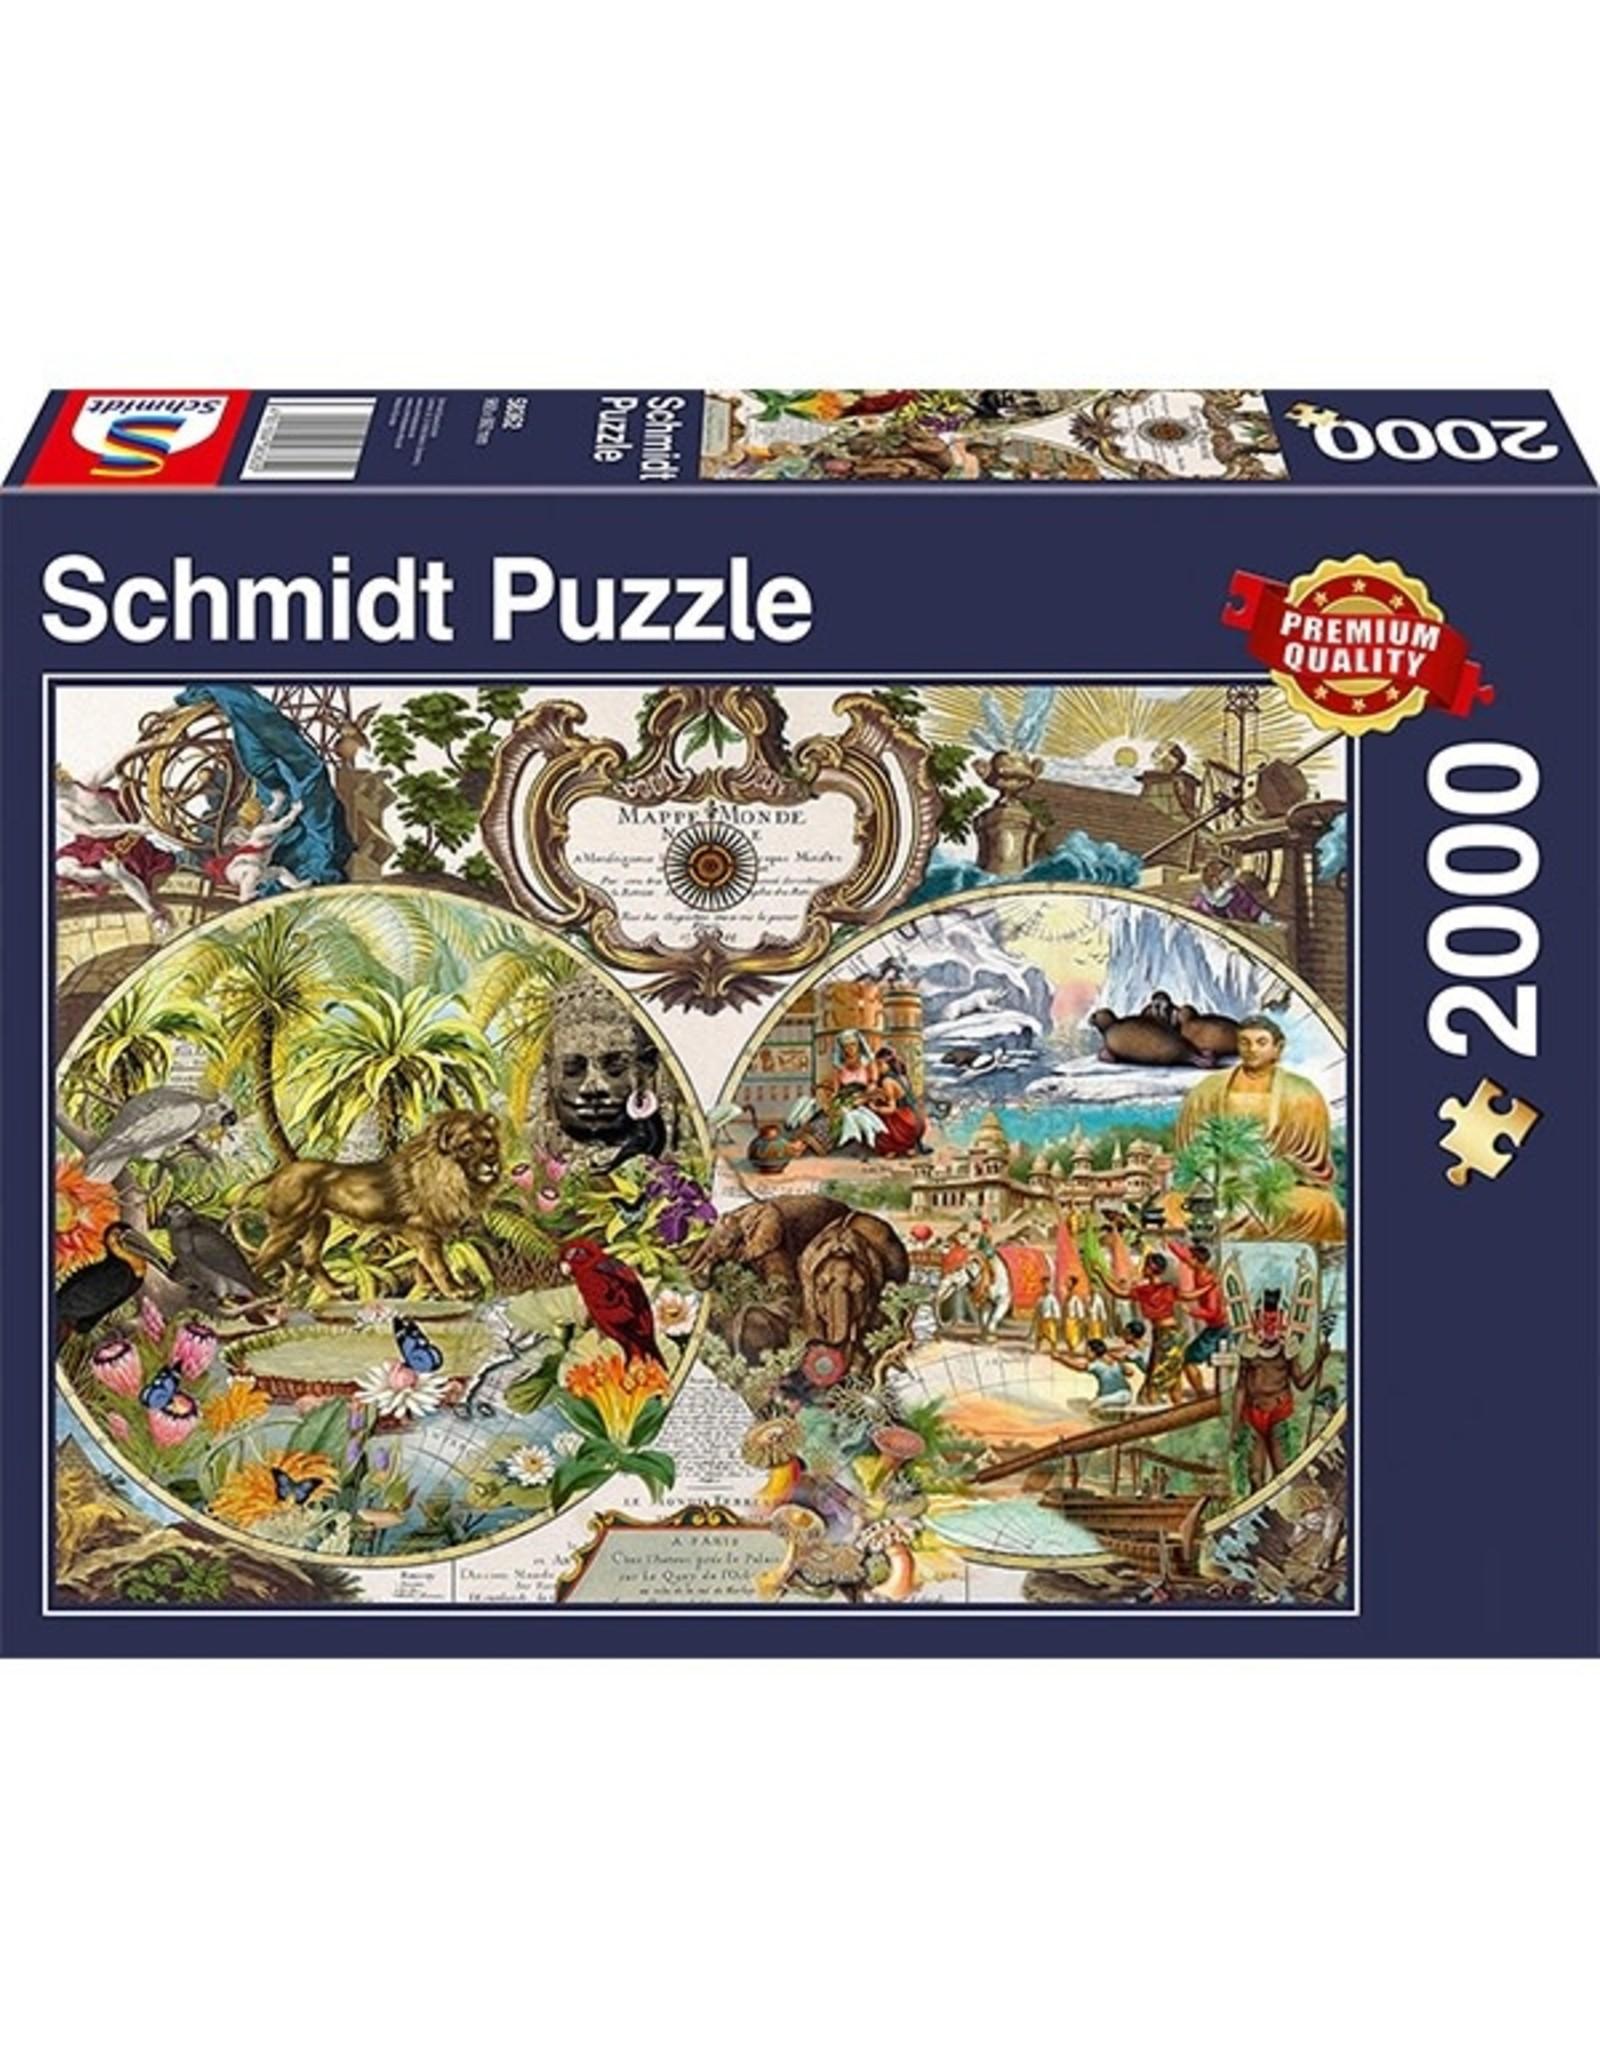 Schmidt Puzzle: 2000 Exotic World Map